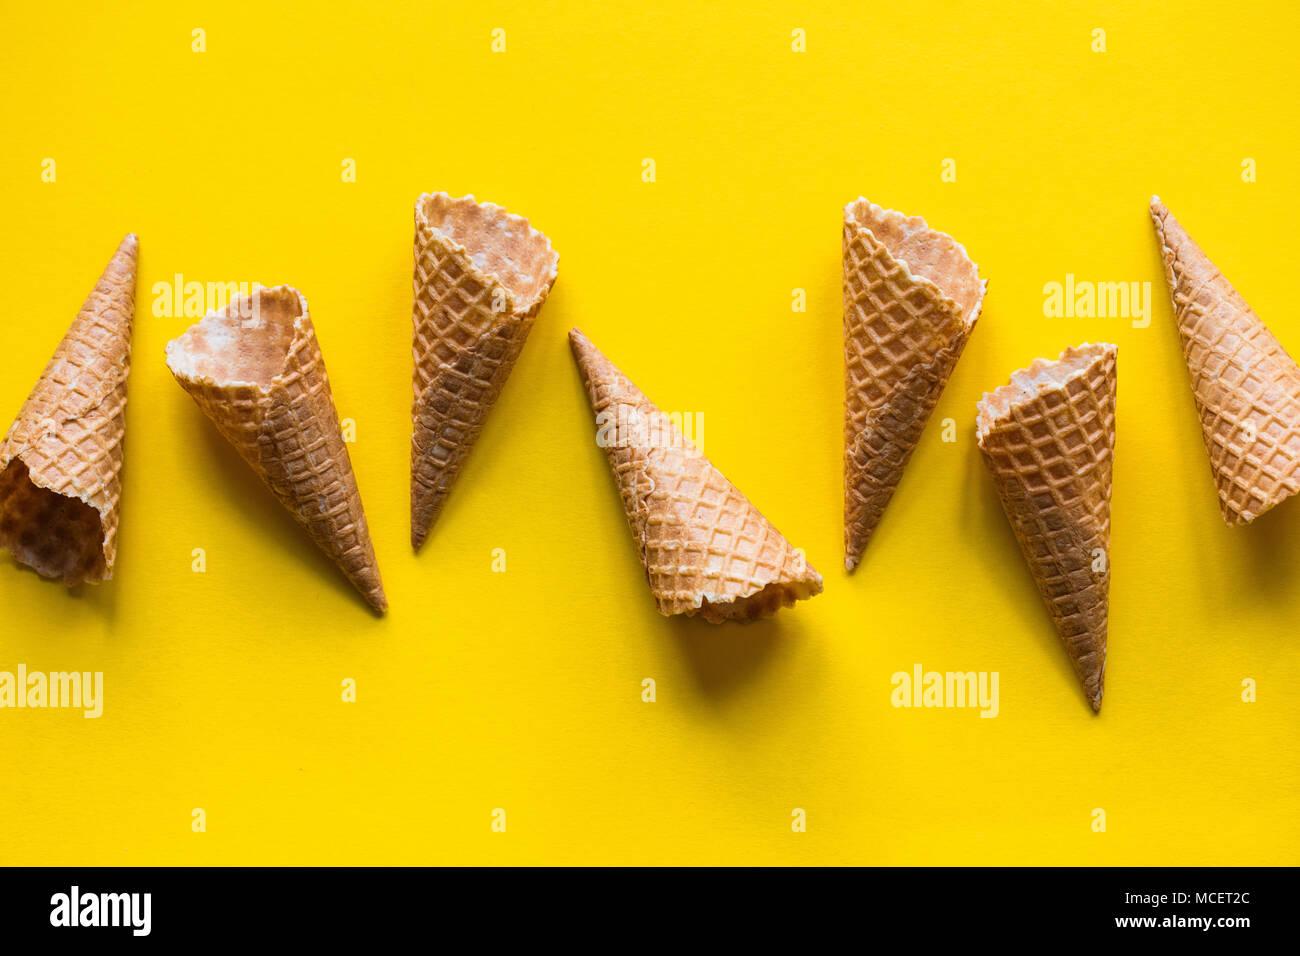 Gaufre gaufre vide ice cream cone sur un fond jaune lumineux Photo Stock